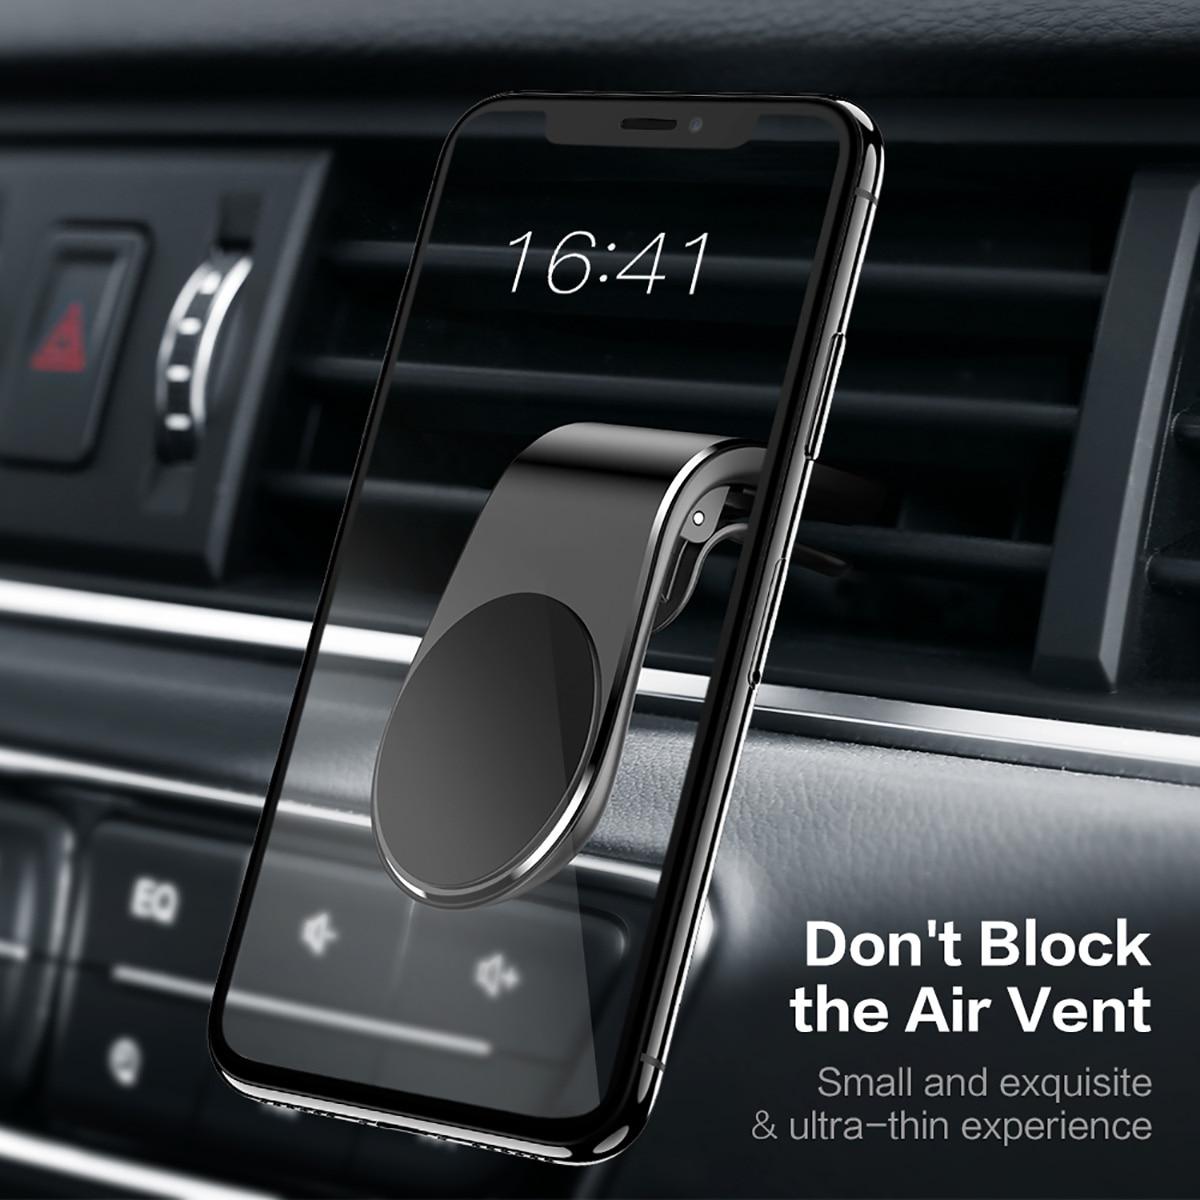 HTB1IQUUX21G3KVjSZFkq6yK4XXaz - Minimalist Magnetic Car Phone Holder